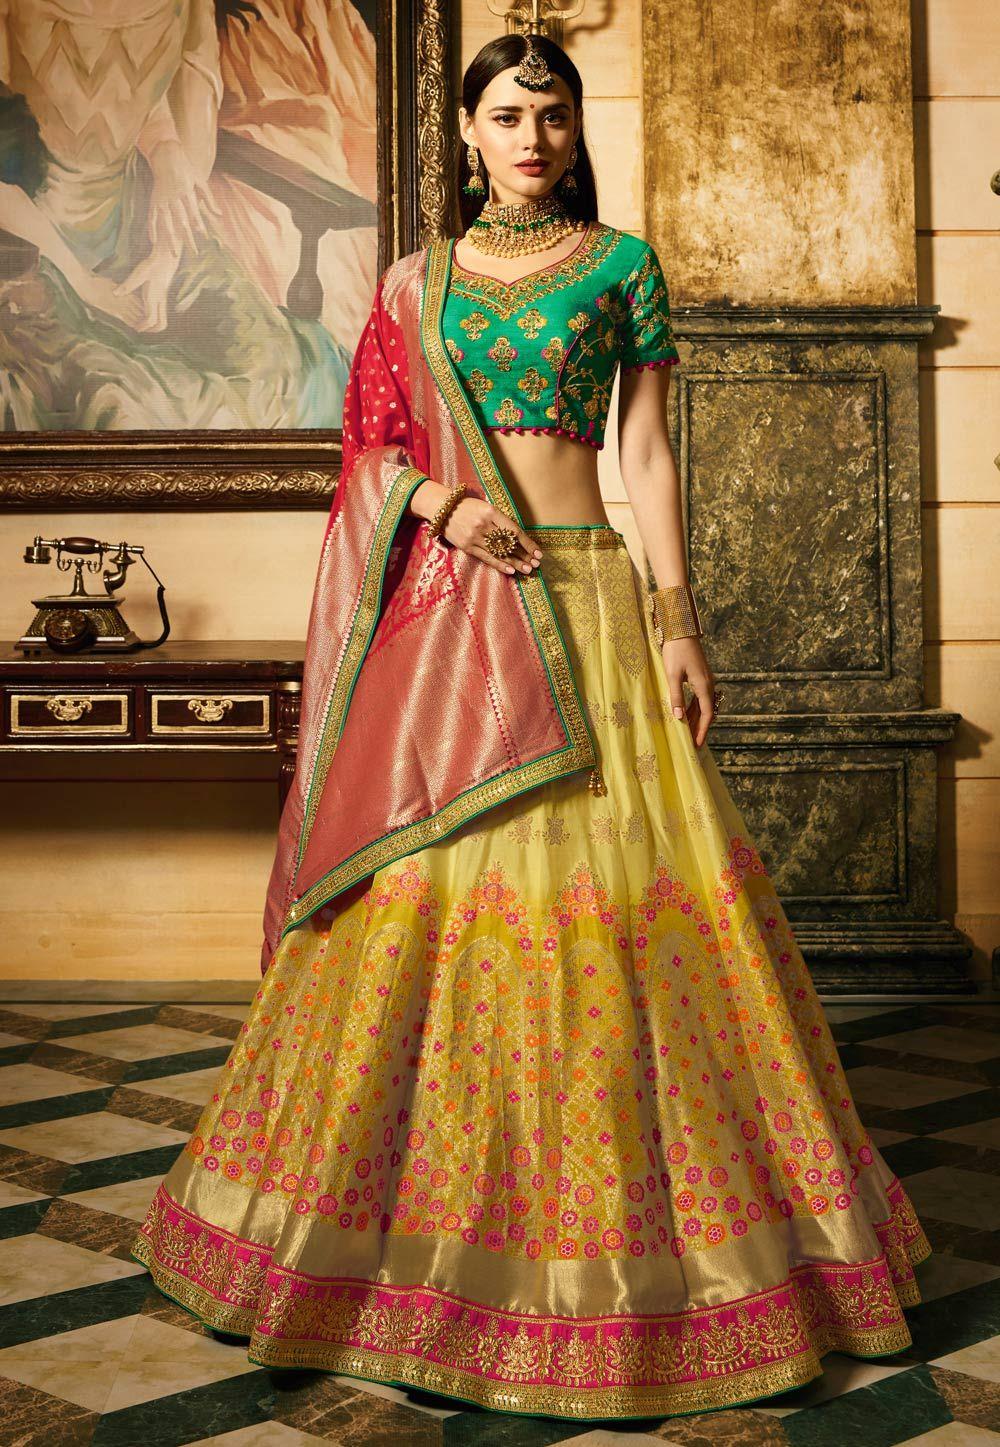 c4c010b453 Buy Yellow Banarasi Silk Circular Lehenga Choli 153914 online at best price  from vast collection of Lehenga Choli and Chaniya Choli at  Indianclothstore.com.